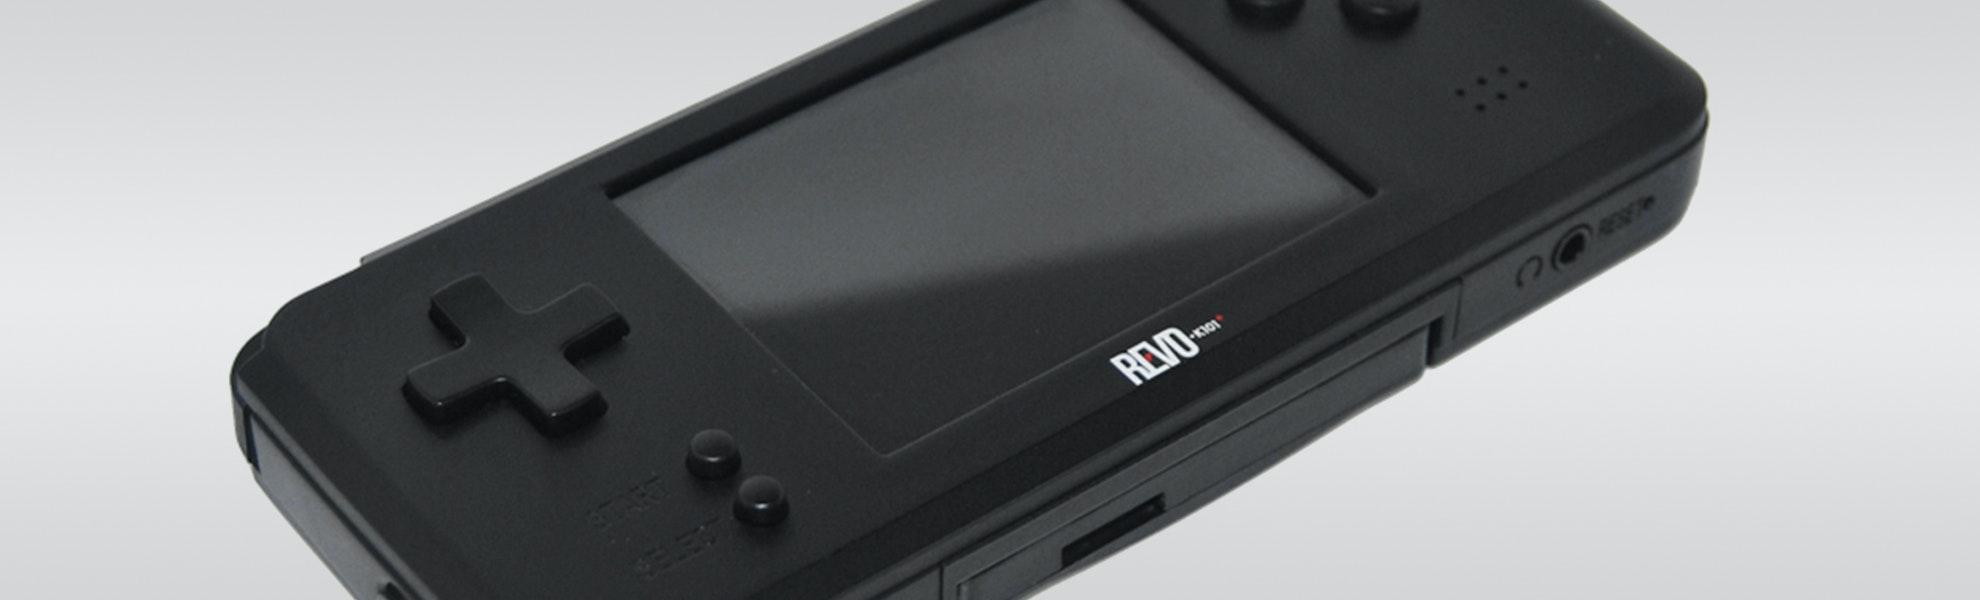 Retro GBA REVO K101 Plus